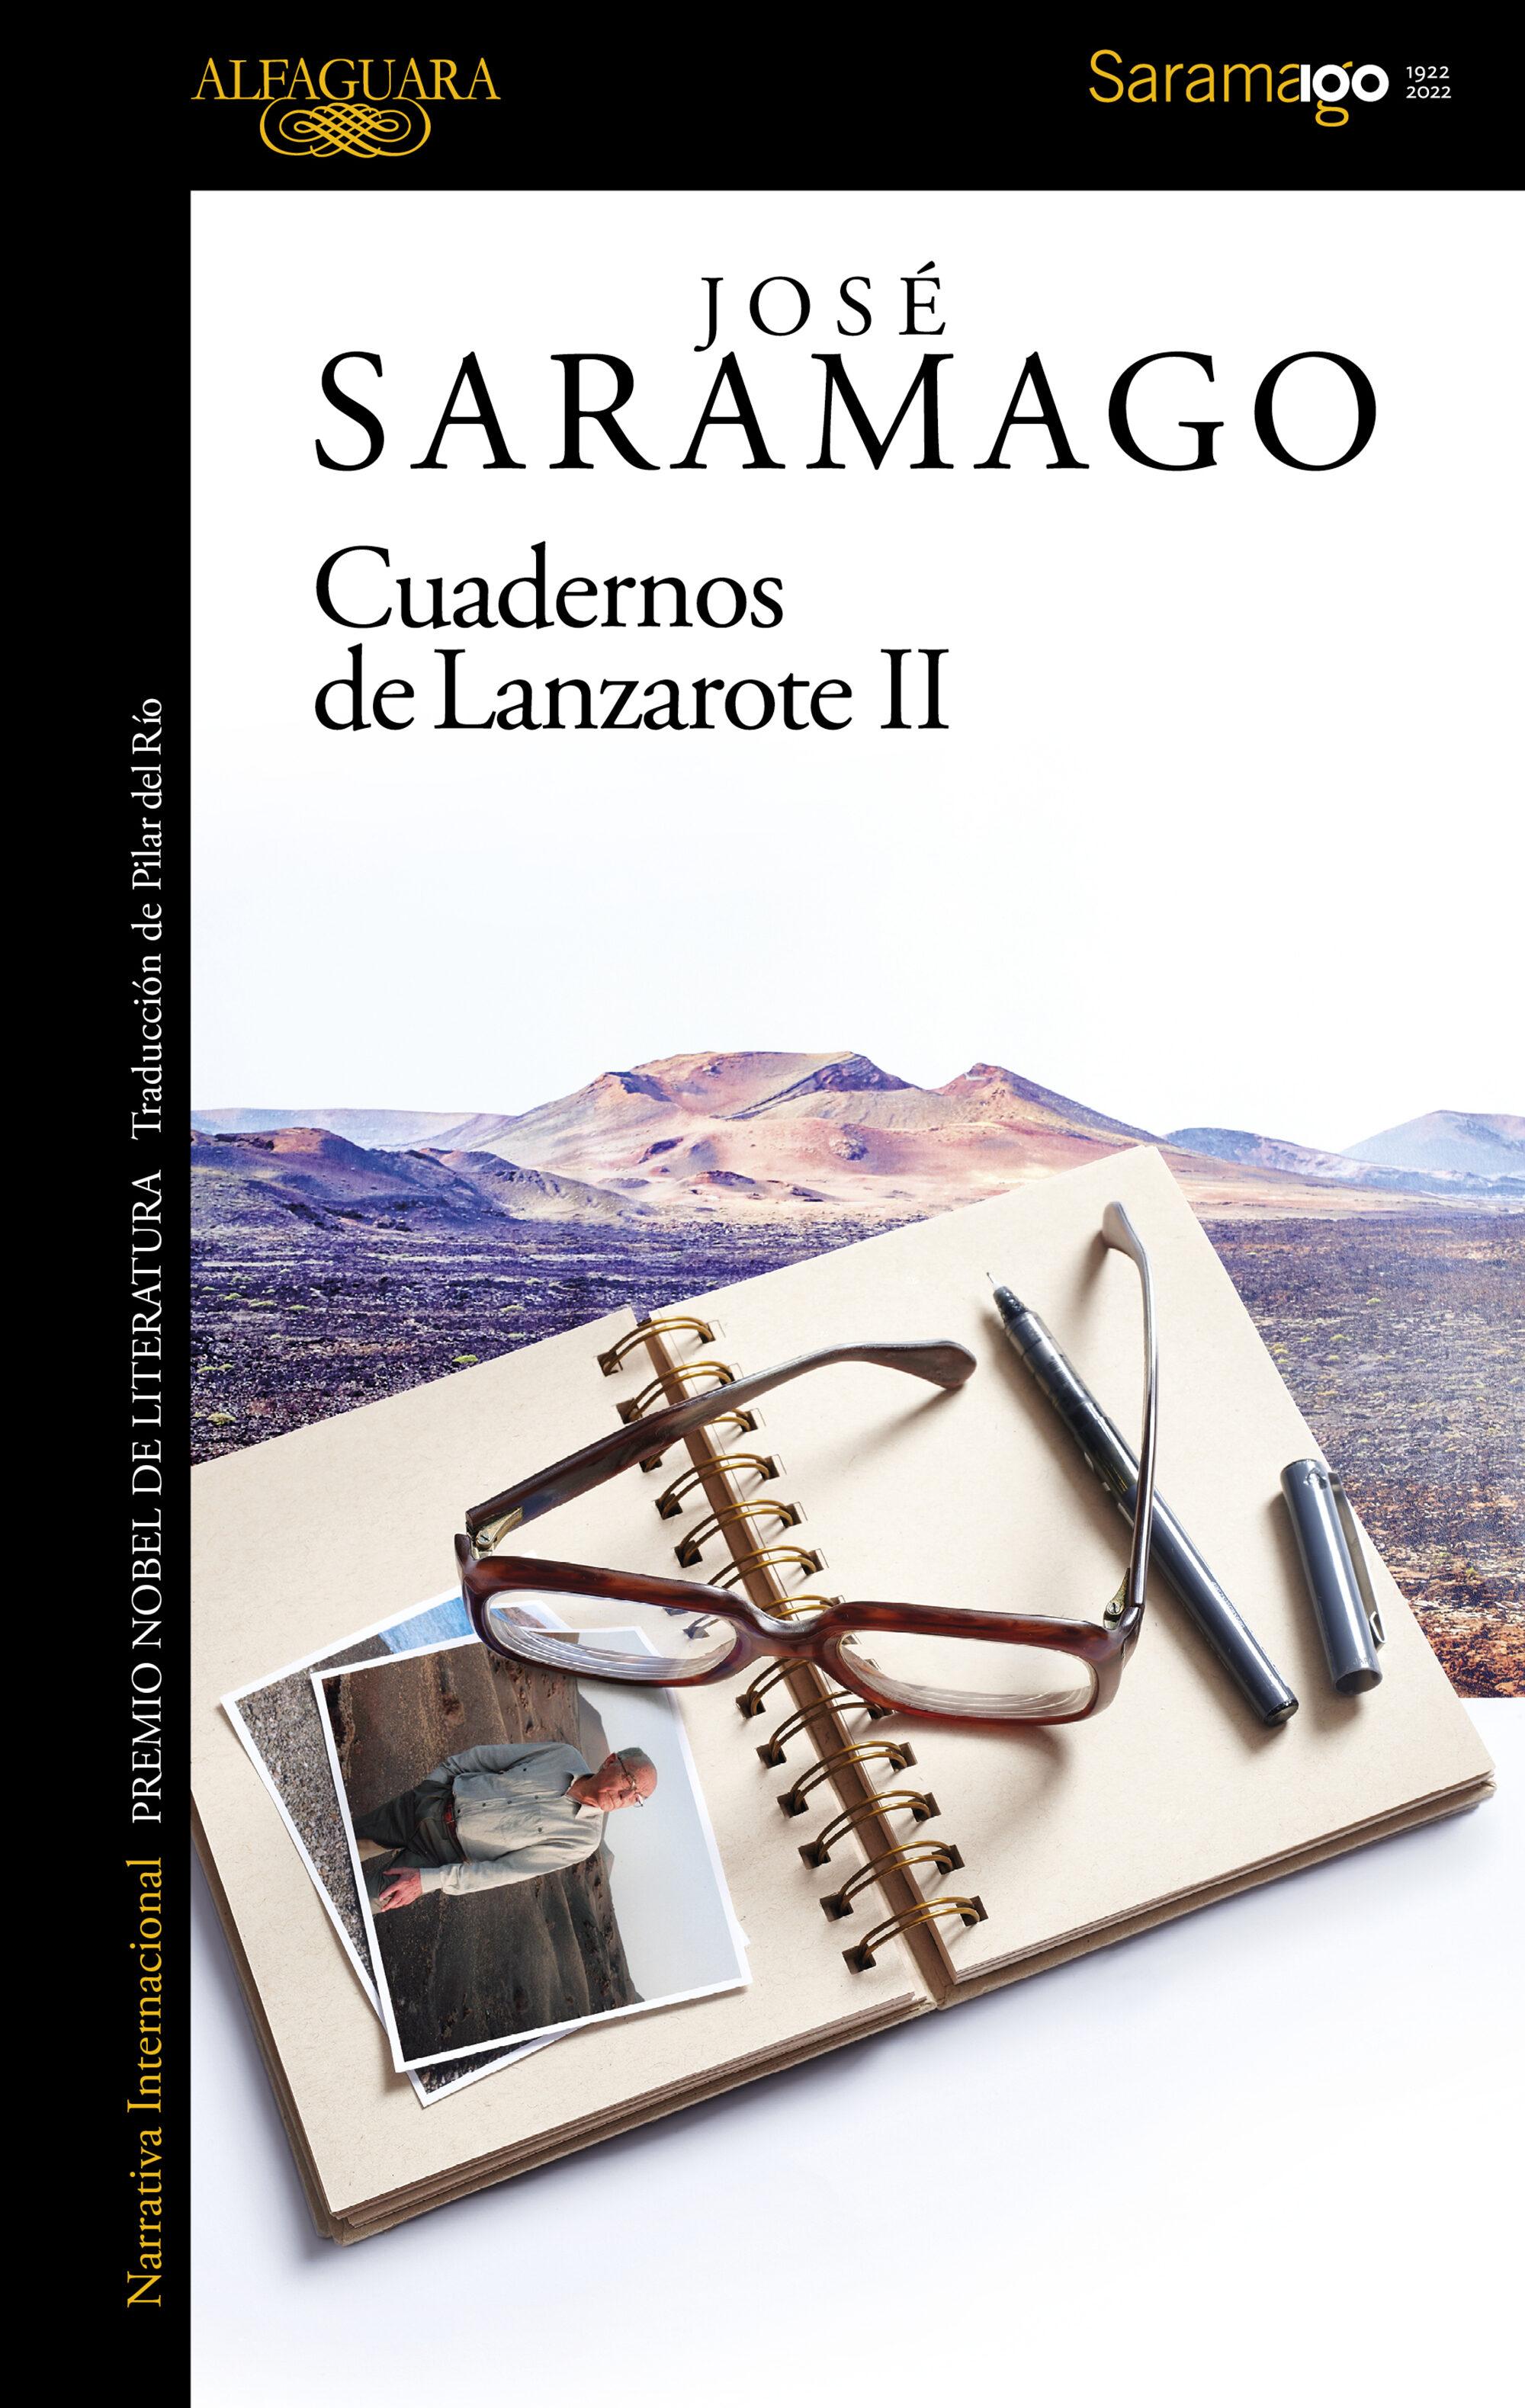 Saramago download jose ebook